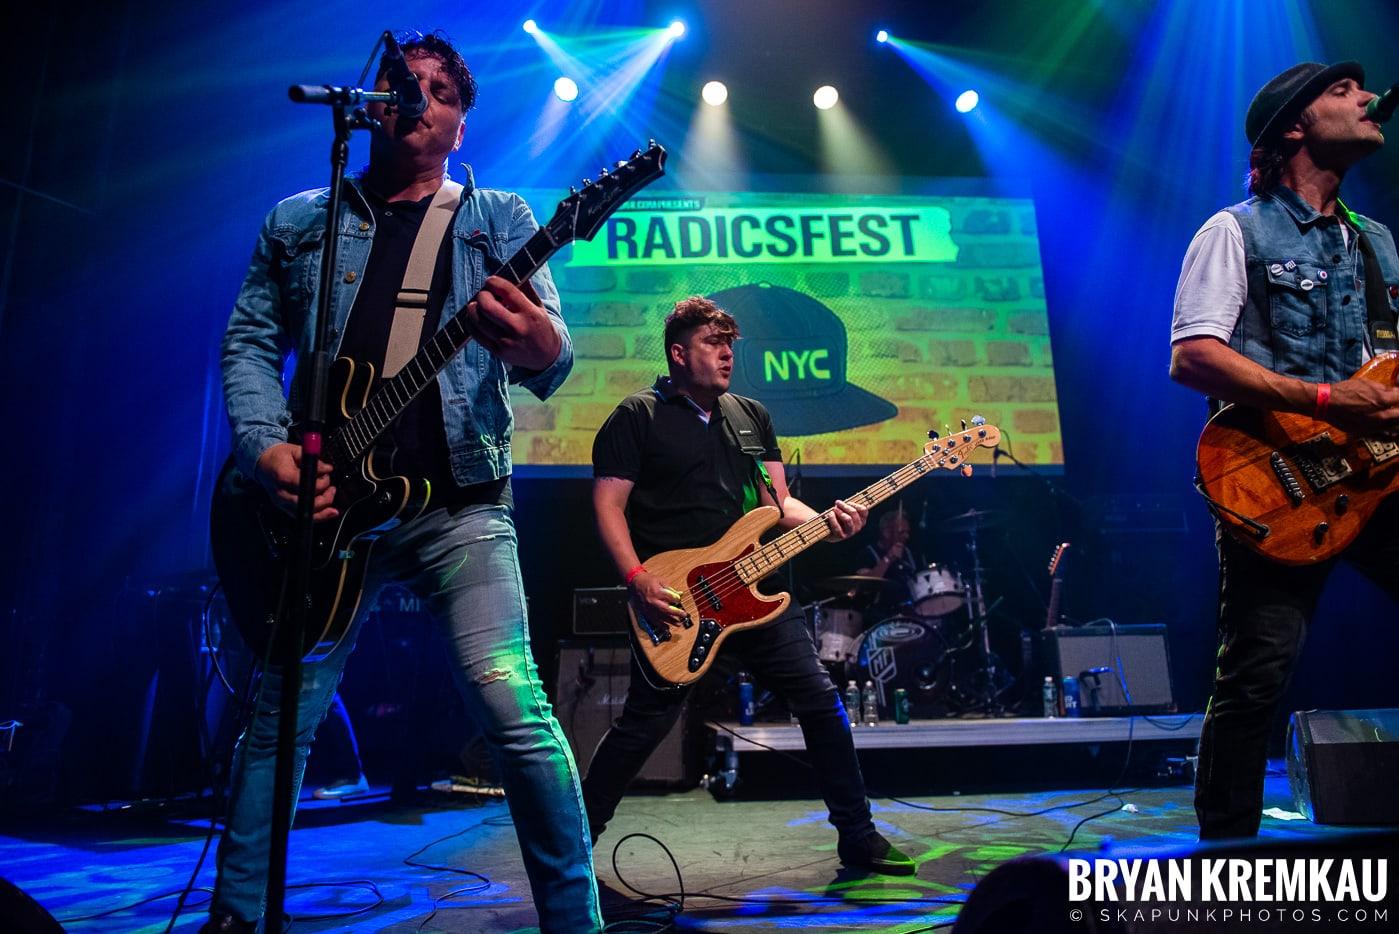 Spring Heeled Jack @ Radicsfest, Gramercy Theatre, NYC - 7.19.19 (41)